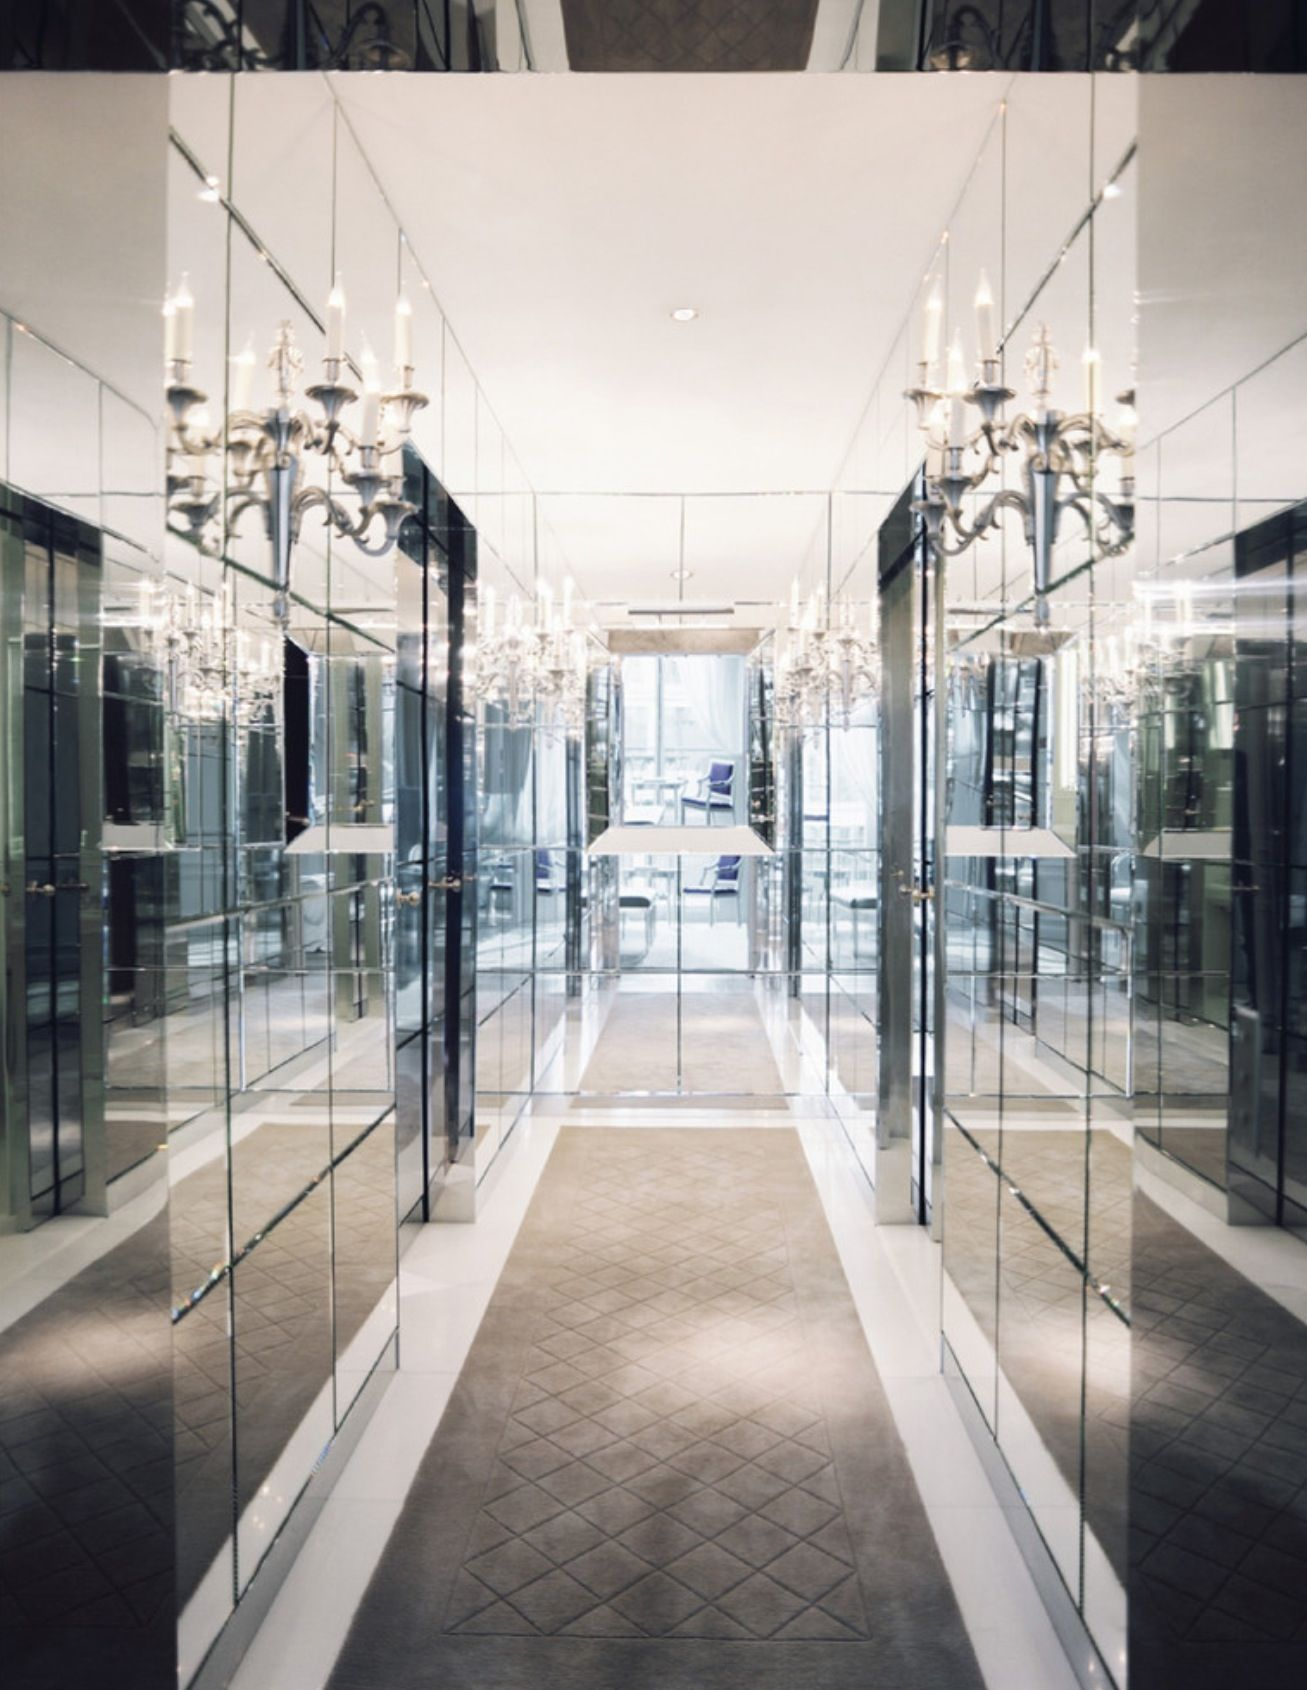 Mirrored corridor | Corridor